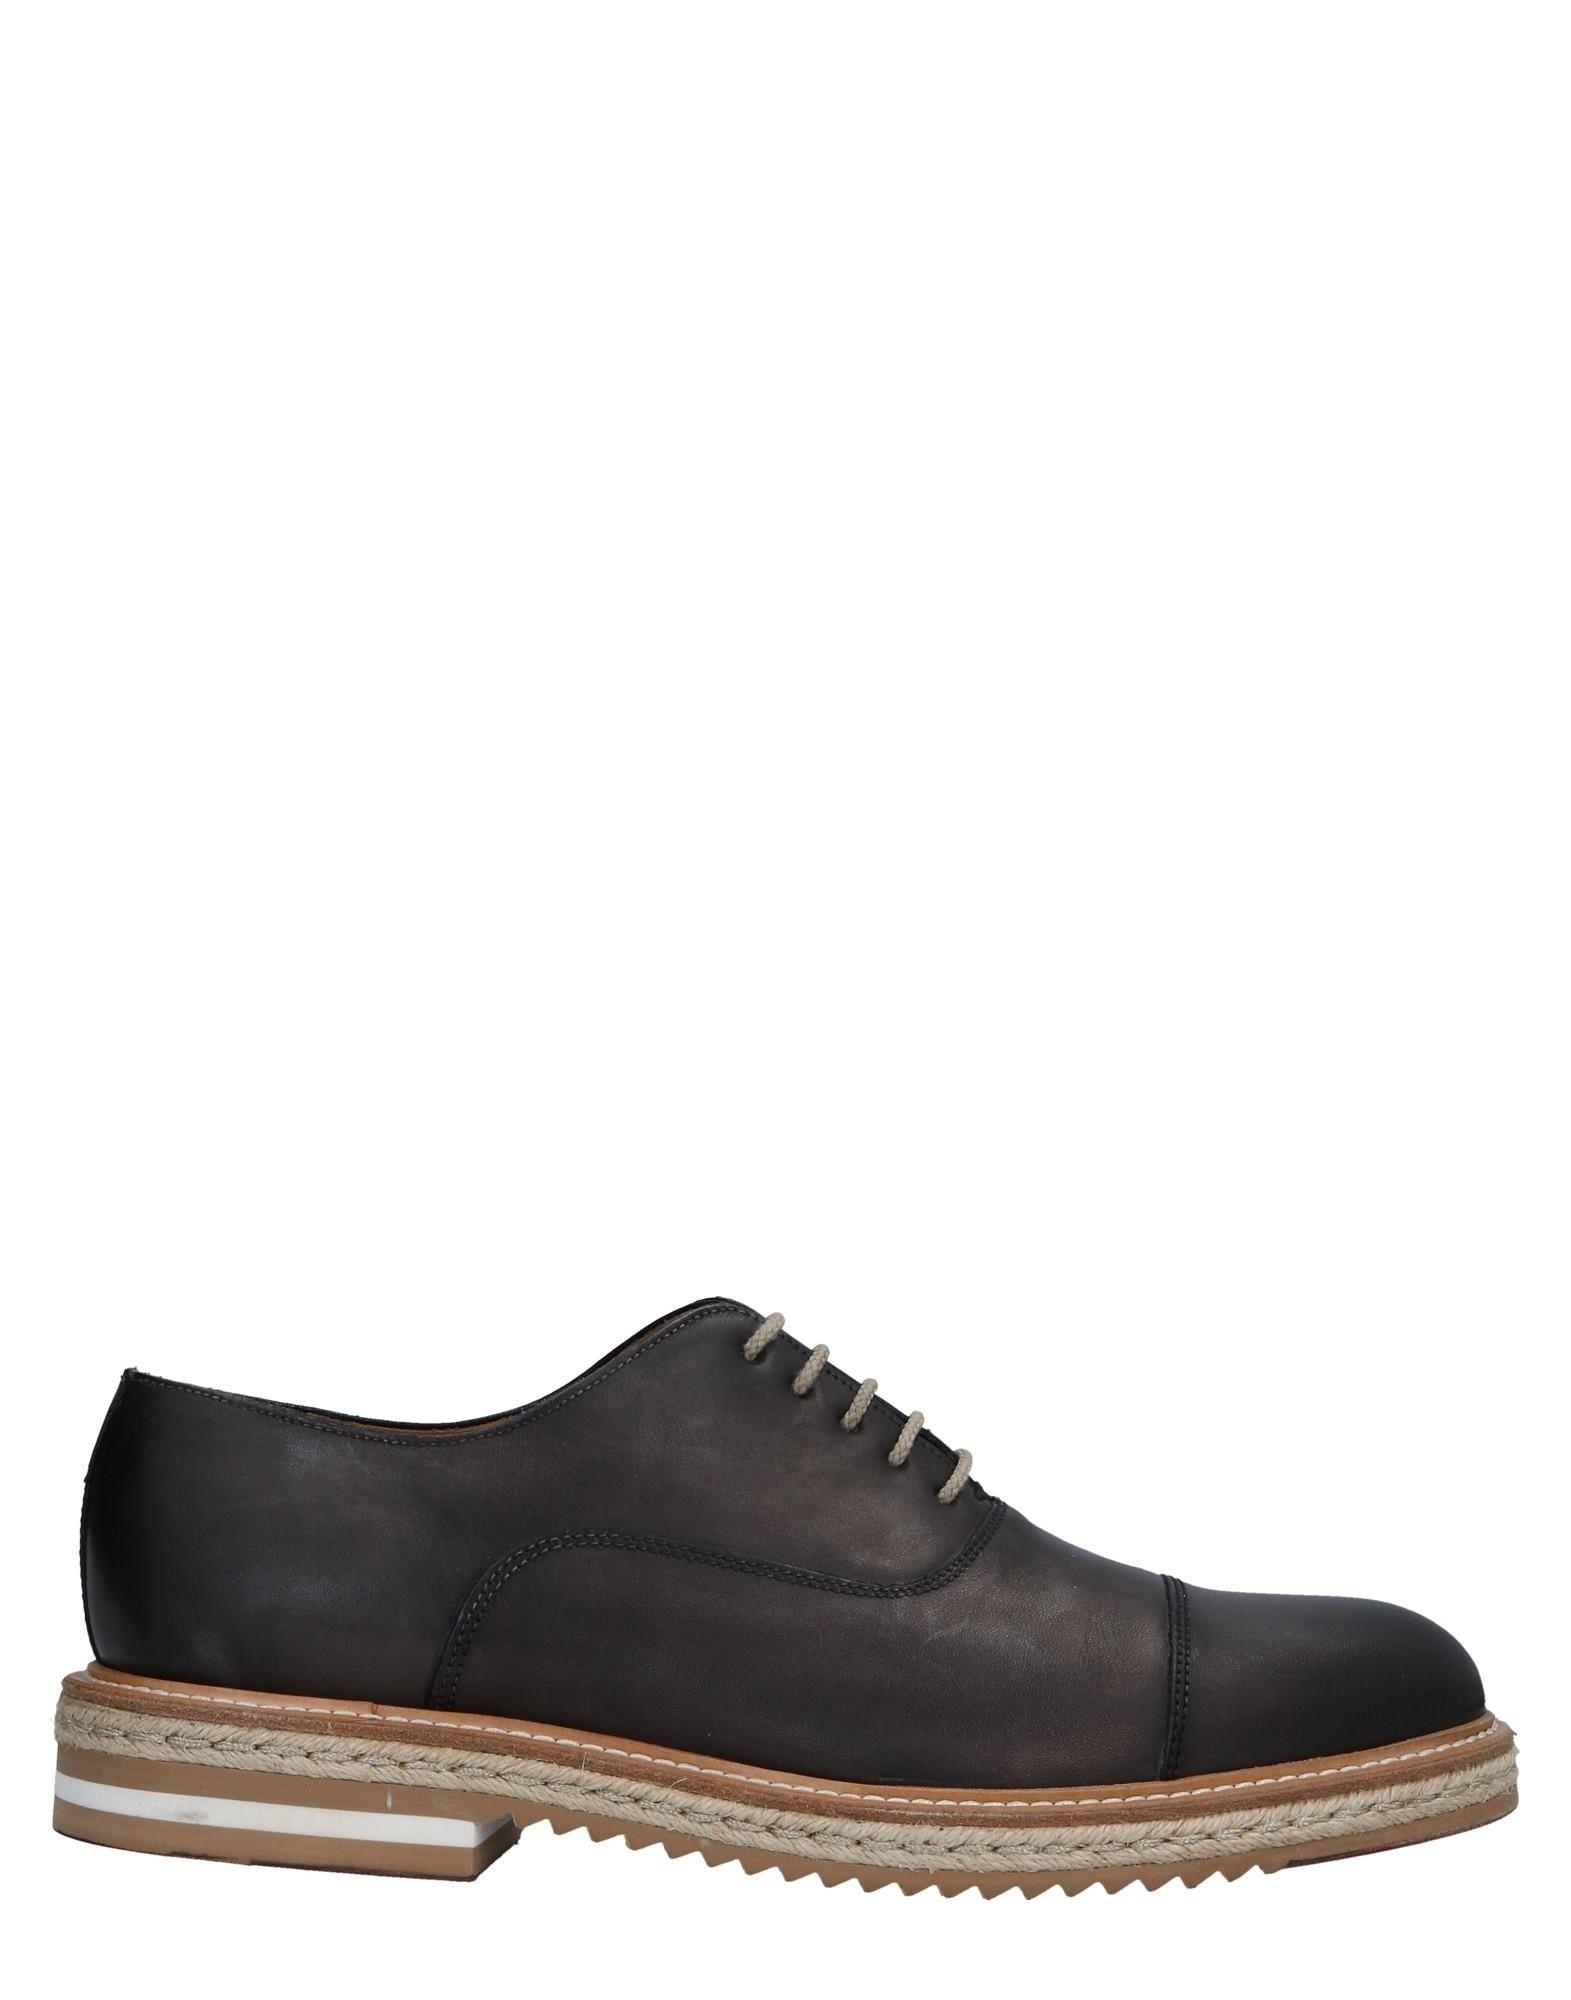 Rabatt echte Schuhe Brecos Schnürschuhe Herren  11520197SC